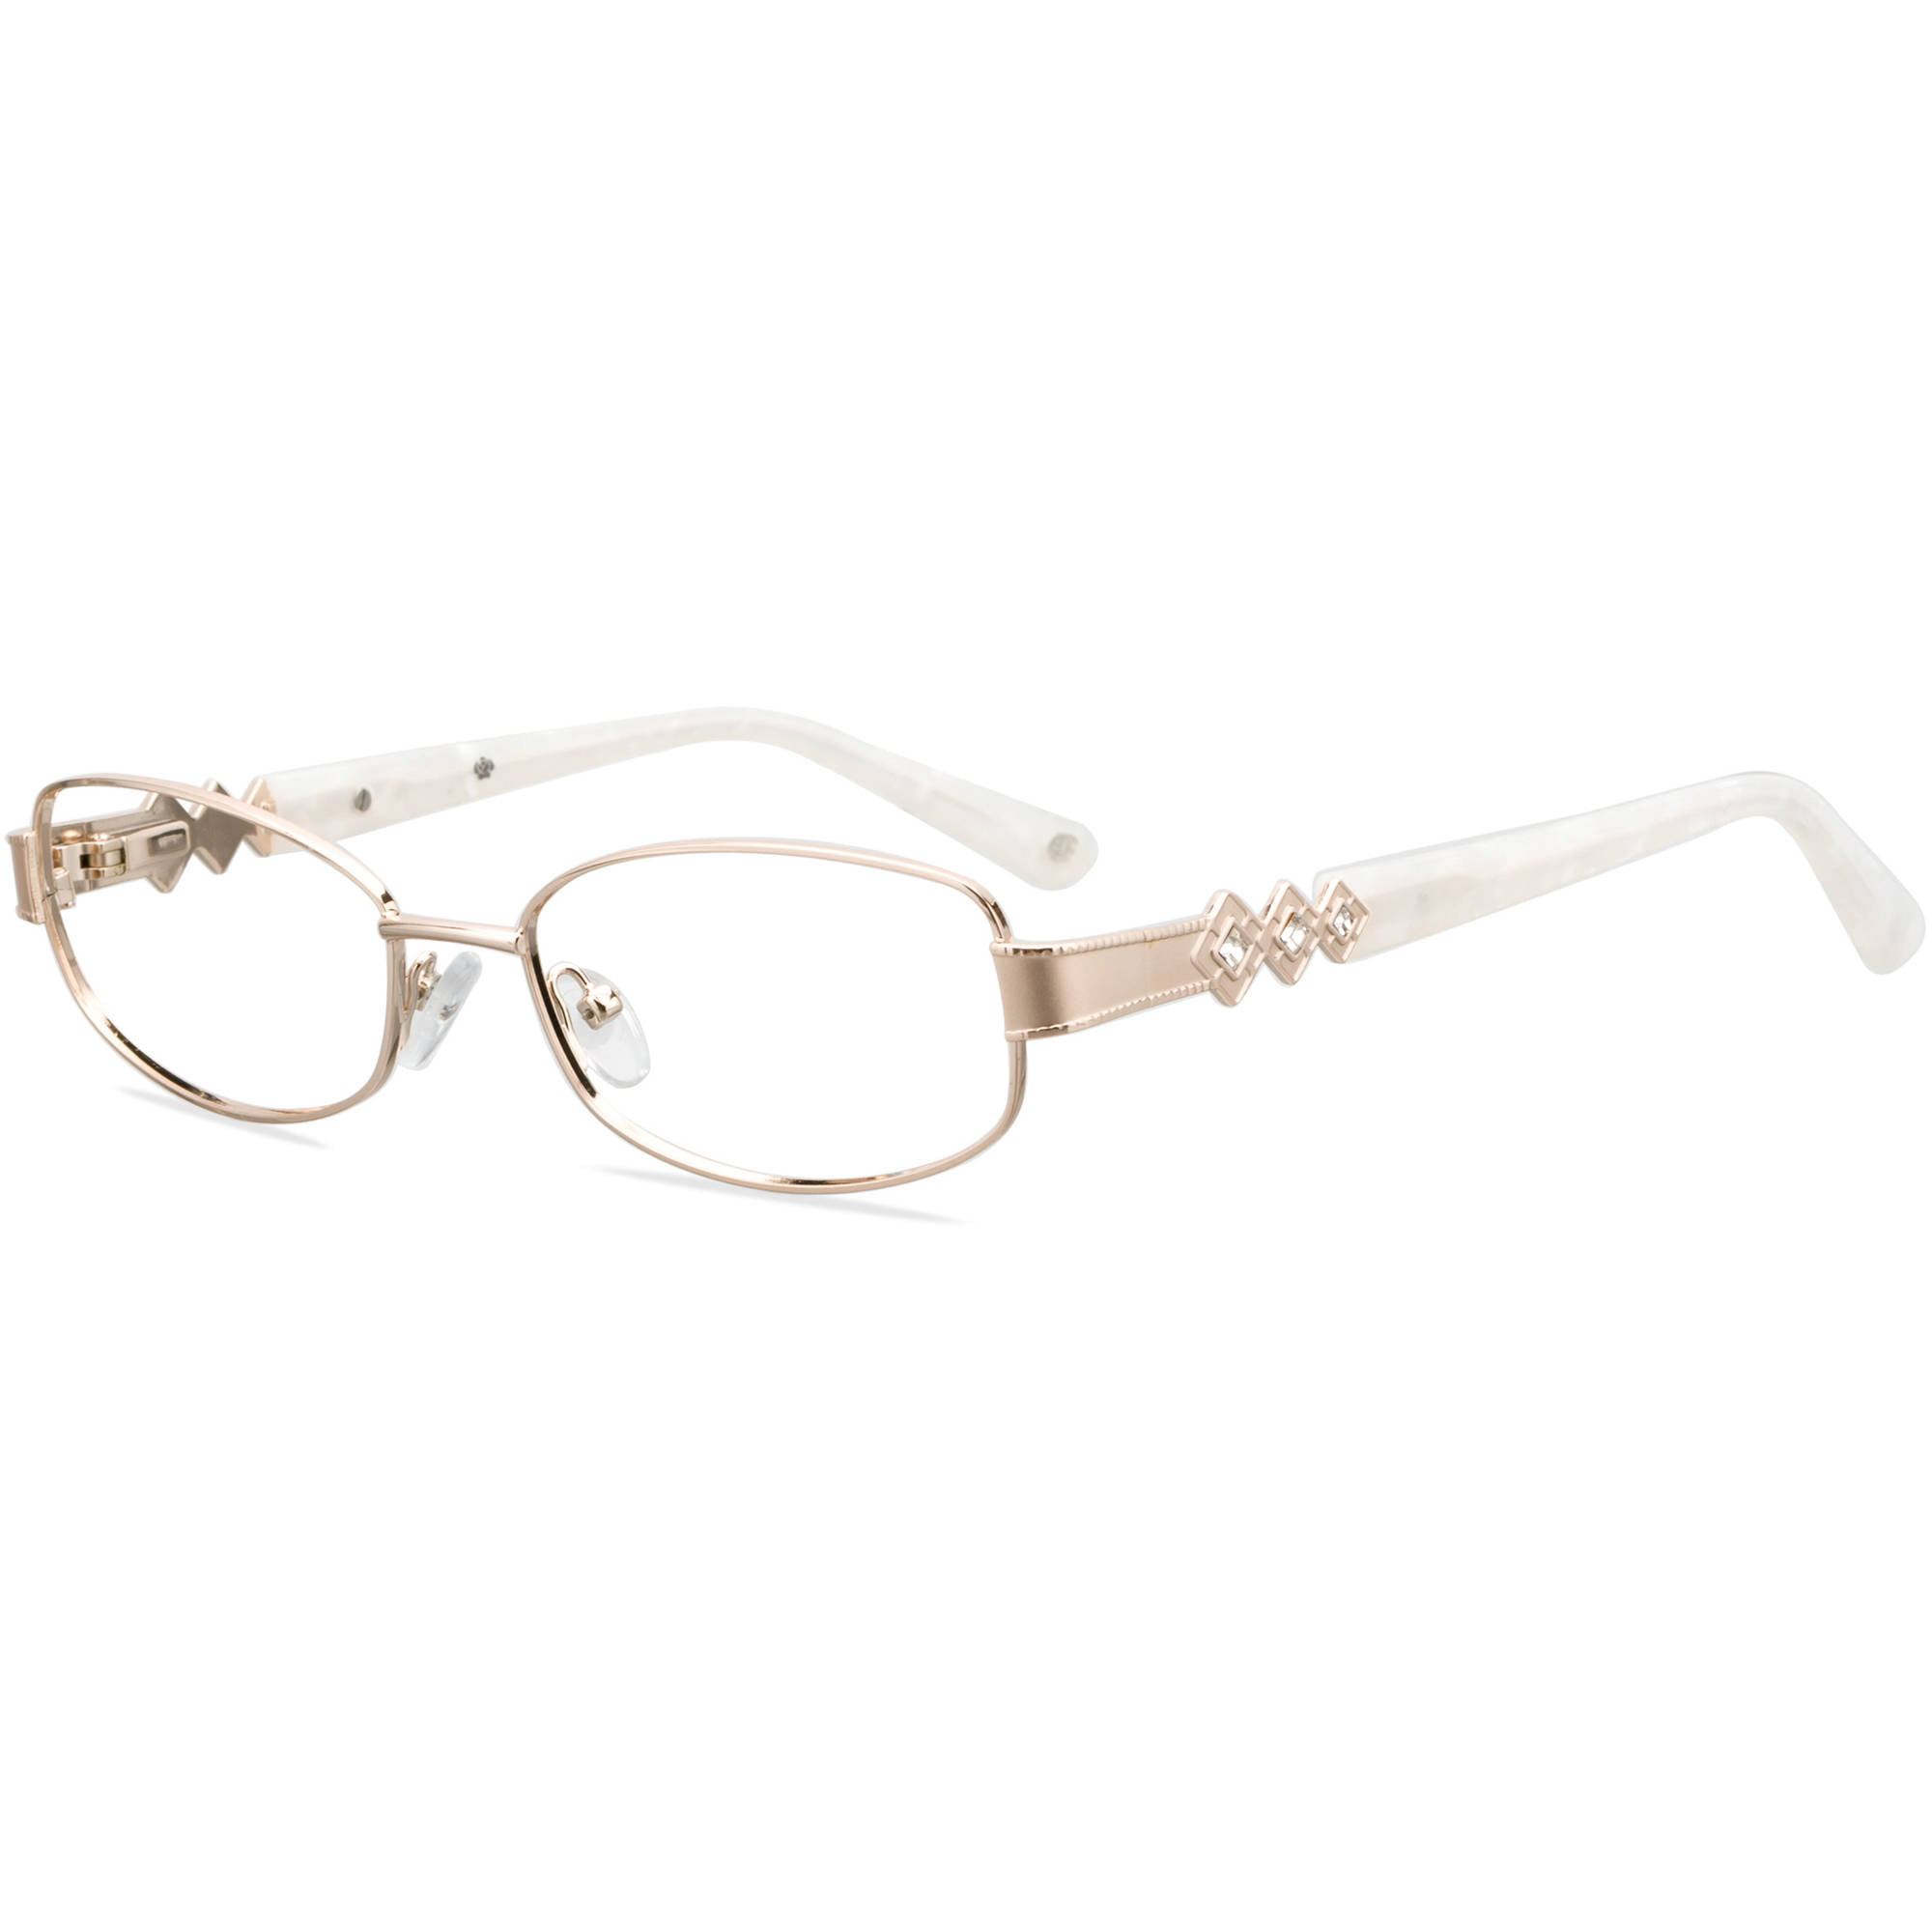 Cheap Ray Ban Style Prescription Glasses Walmart - Shabooms